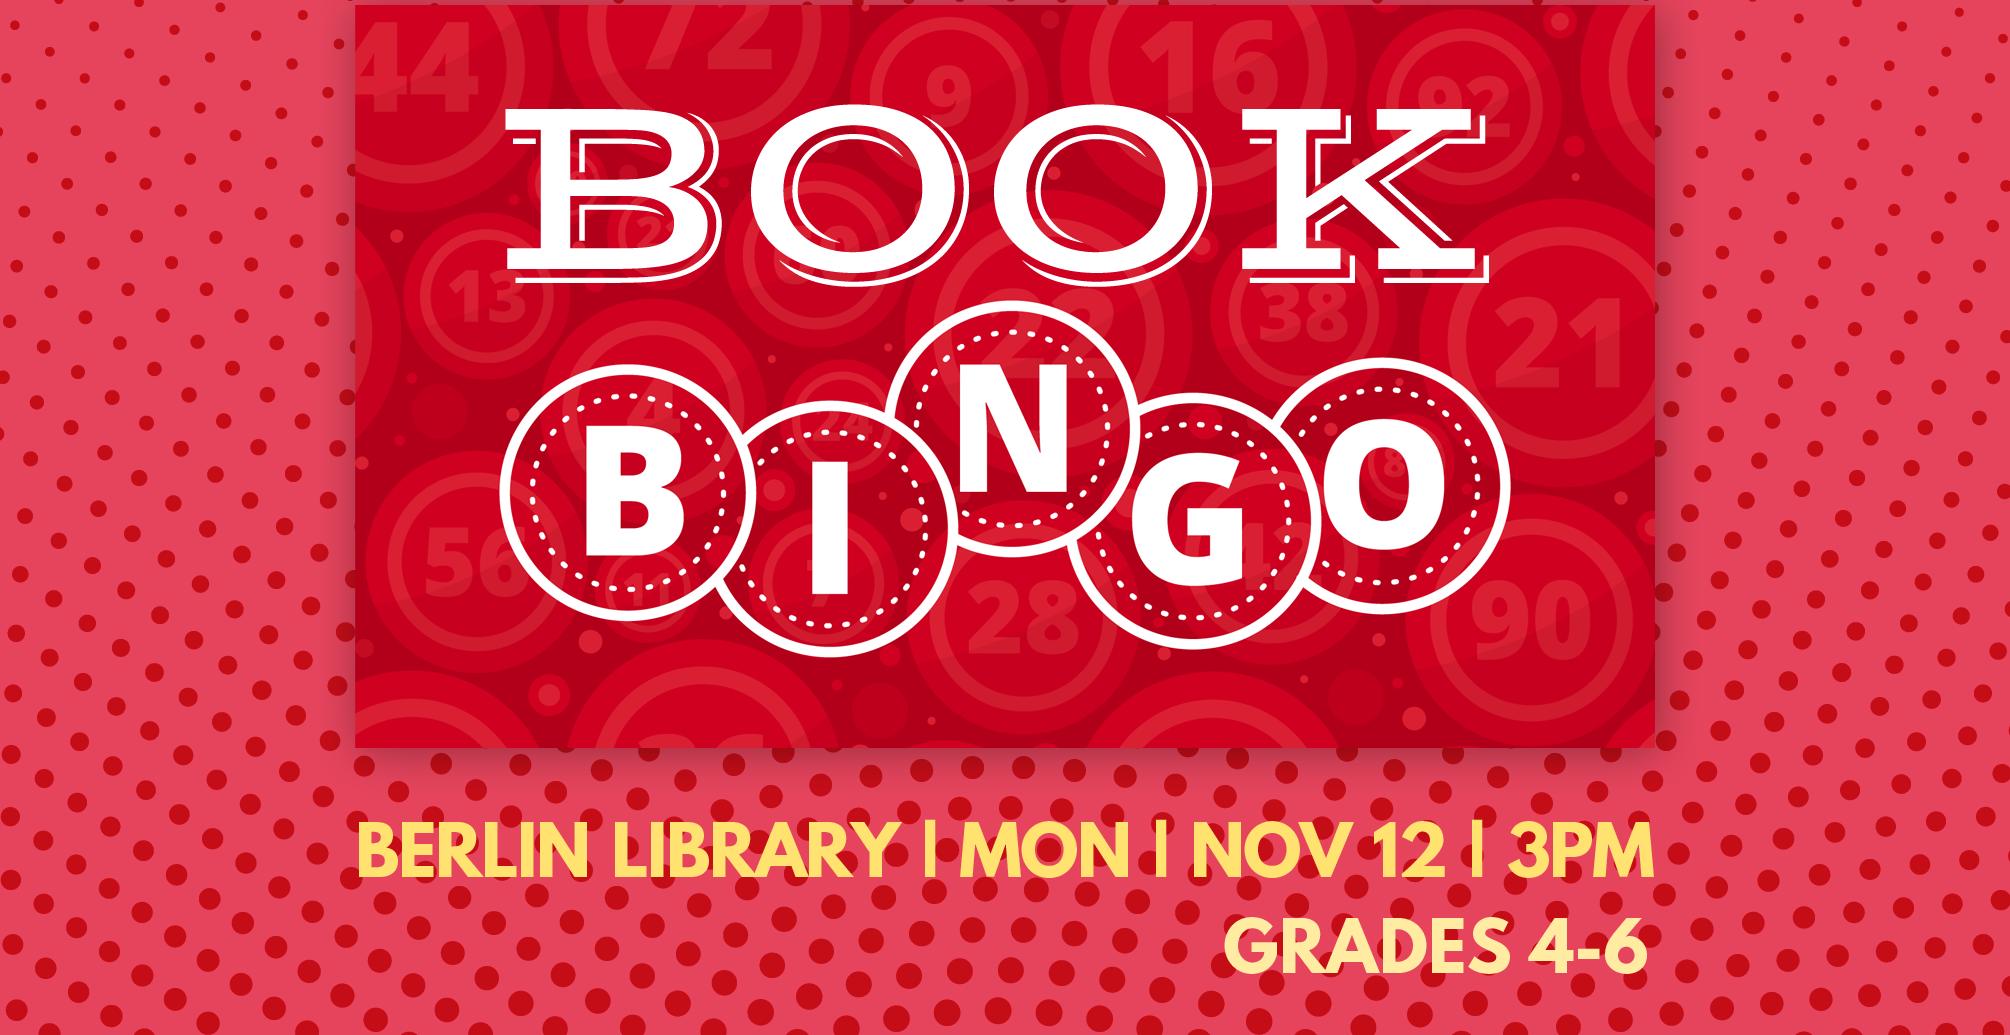 2018-11-CHILDRENS-Berlin-Book-Bingo-Slide